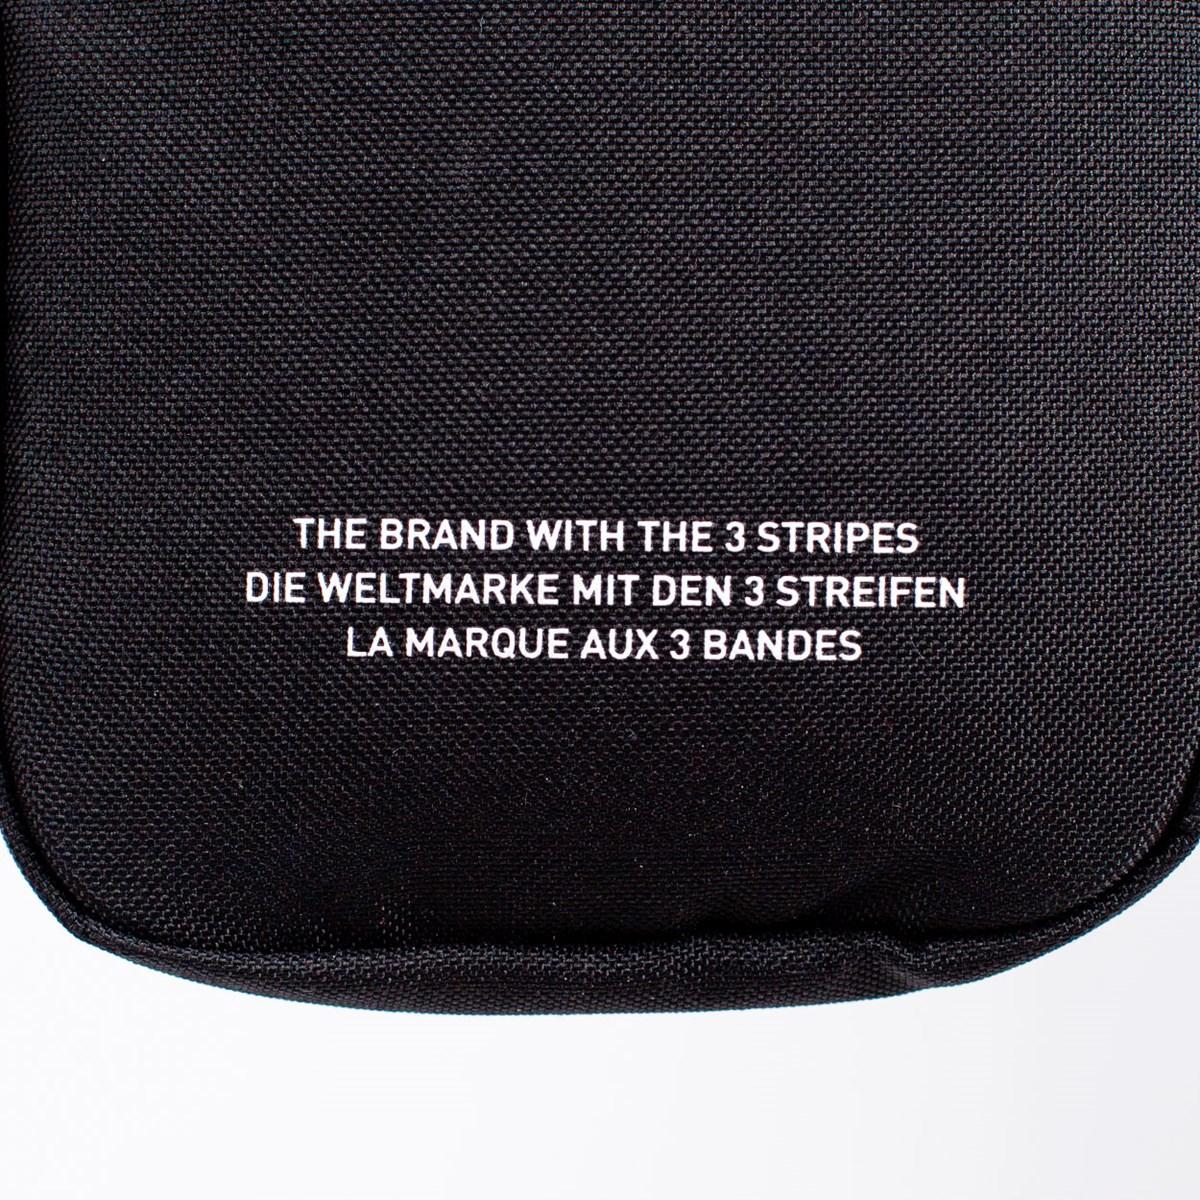 Bolsa Adidas Fest Bag Trefoil Black EI7411